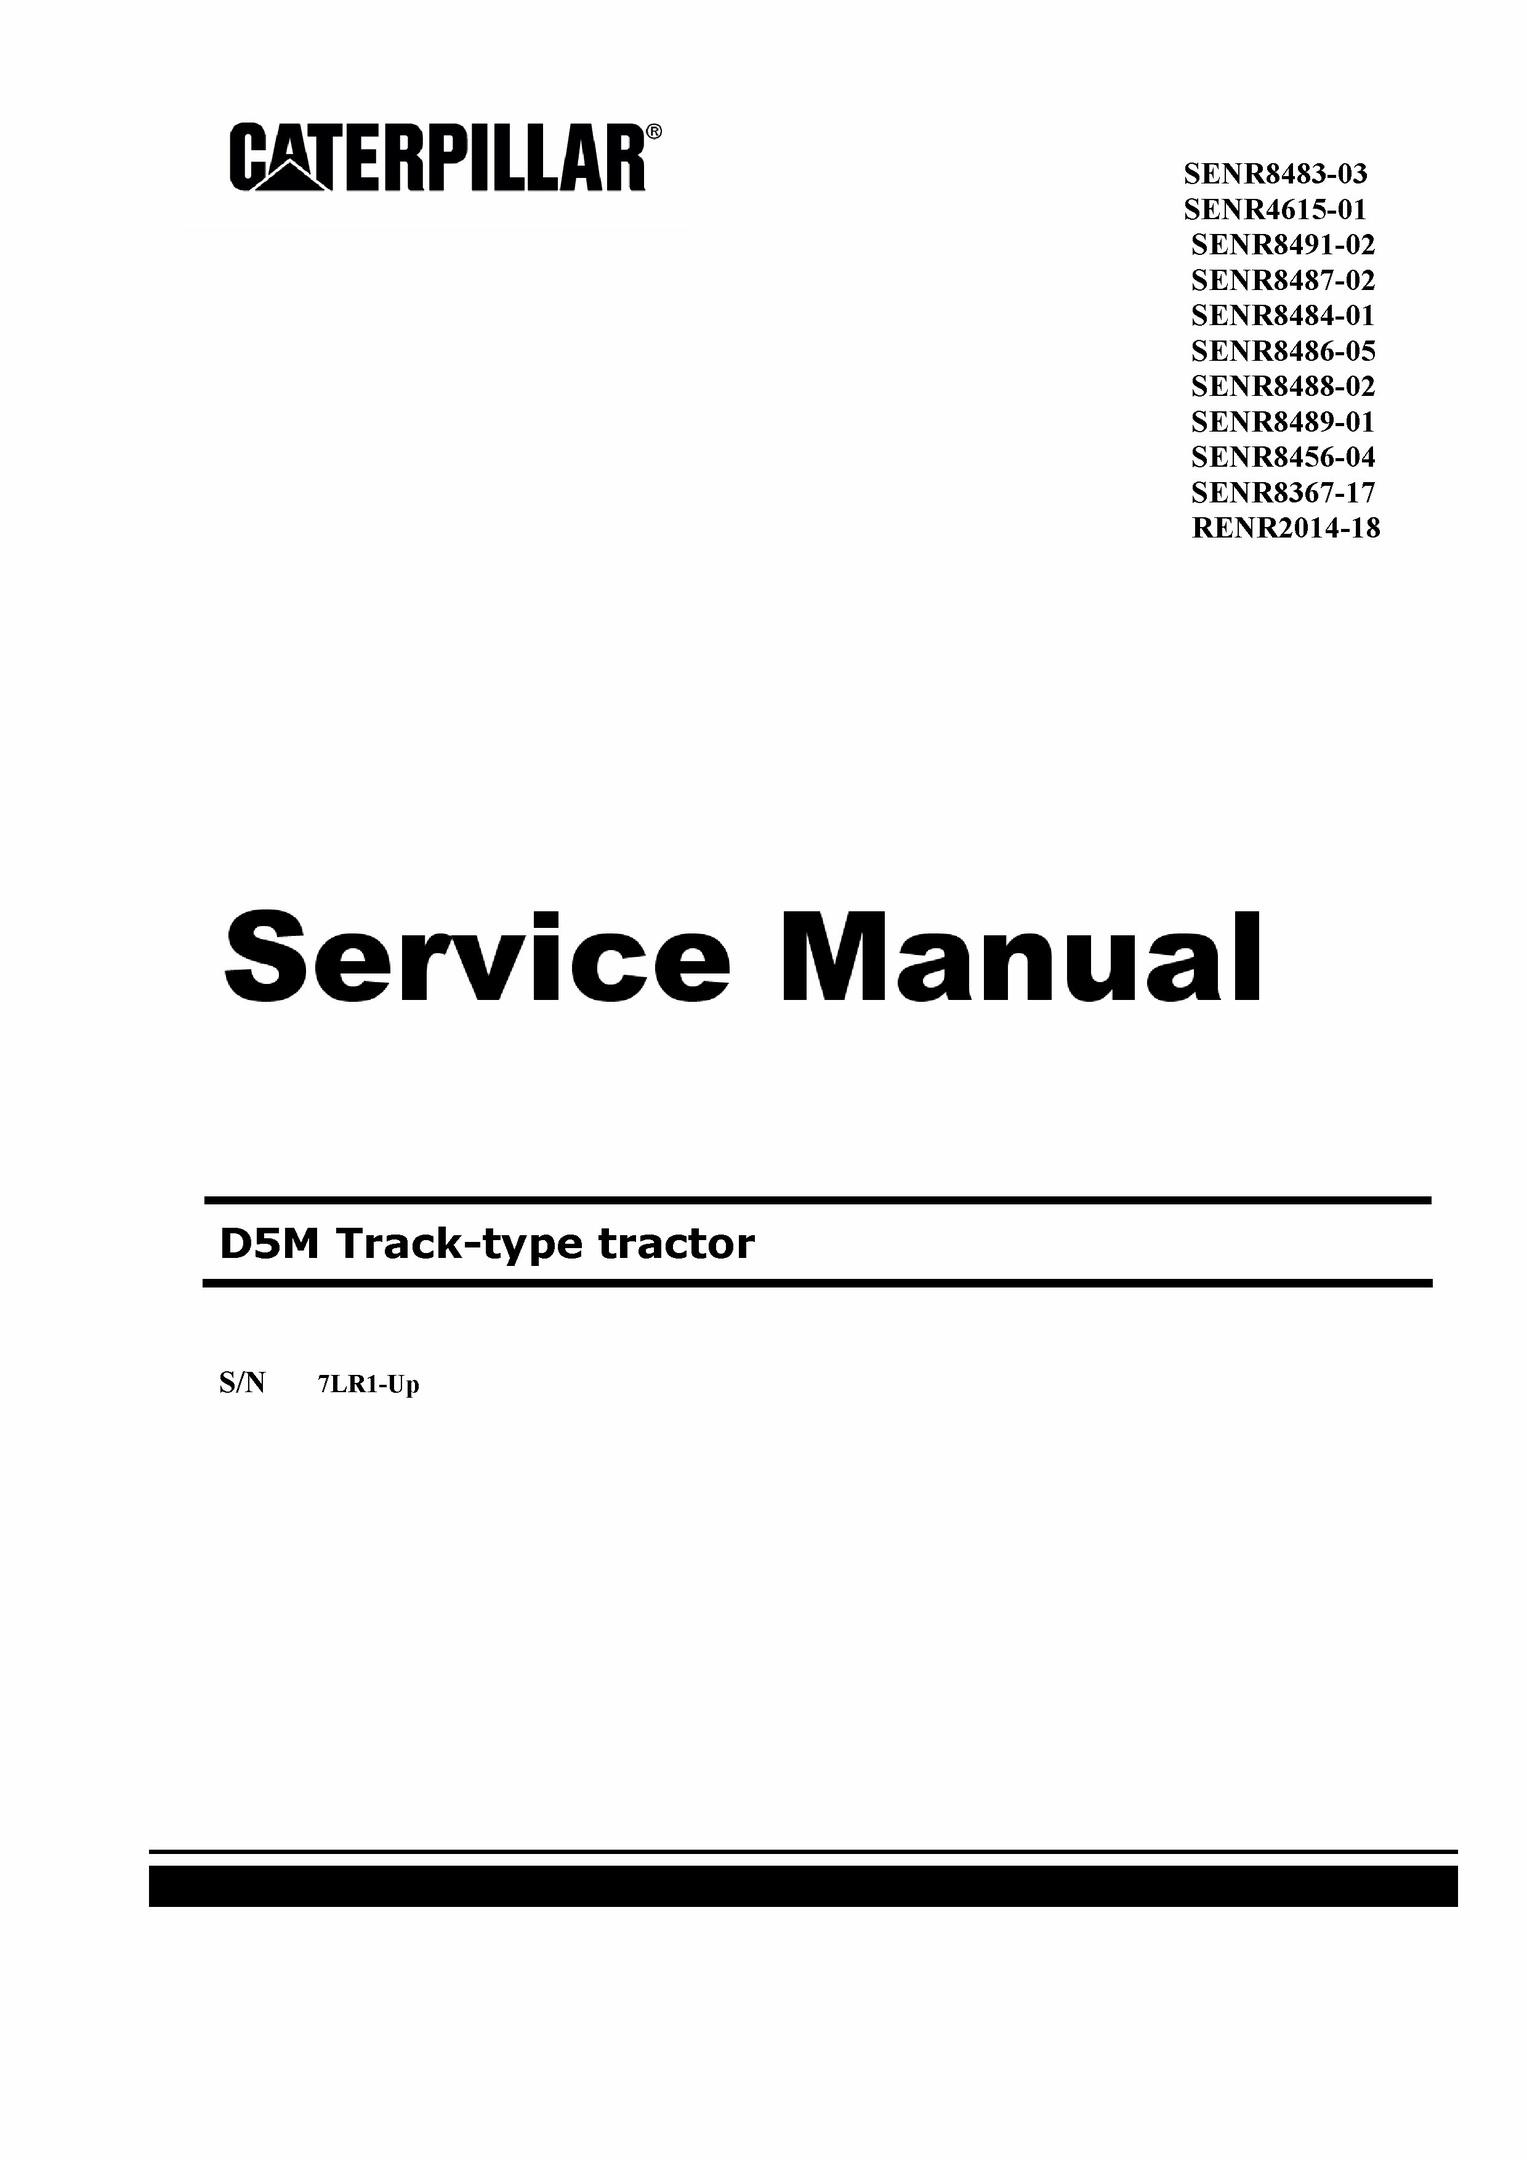 3406 caterpillar service manual cat 3406 truck engine specs 3306 cat engine timing marks diagram [ 1527 x 2160 Pixel ]